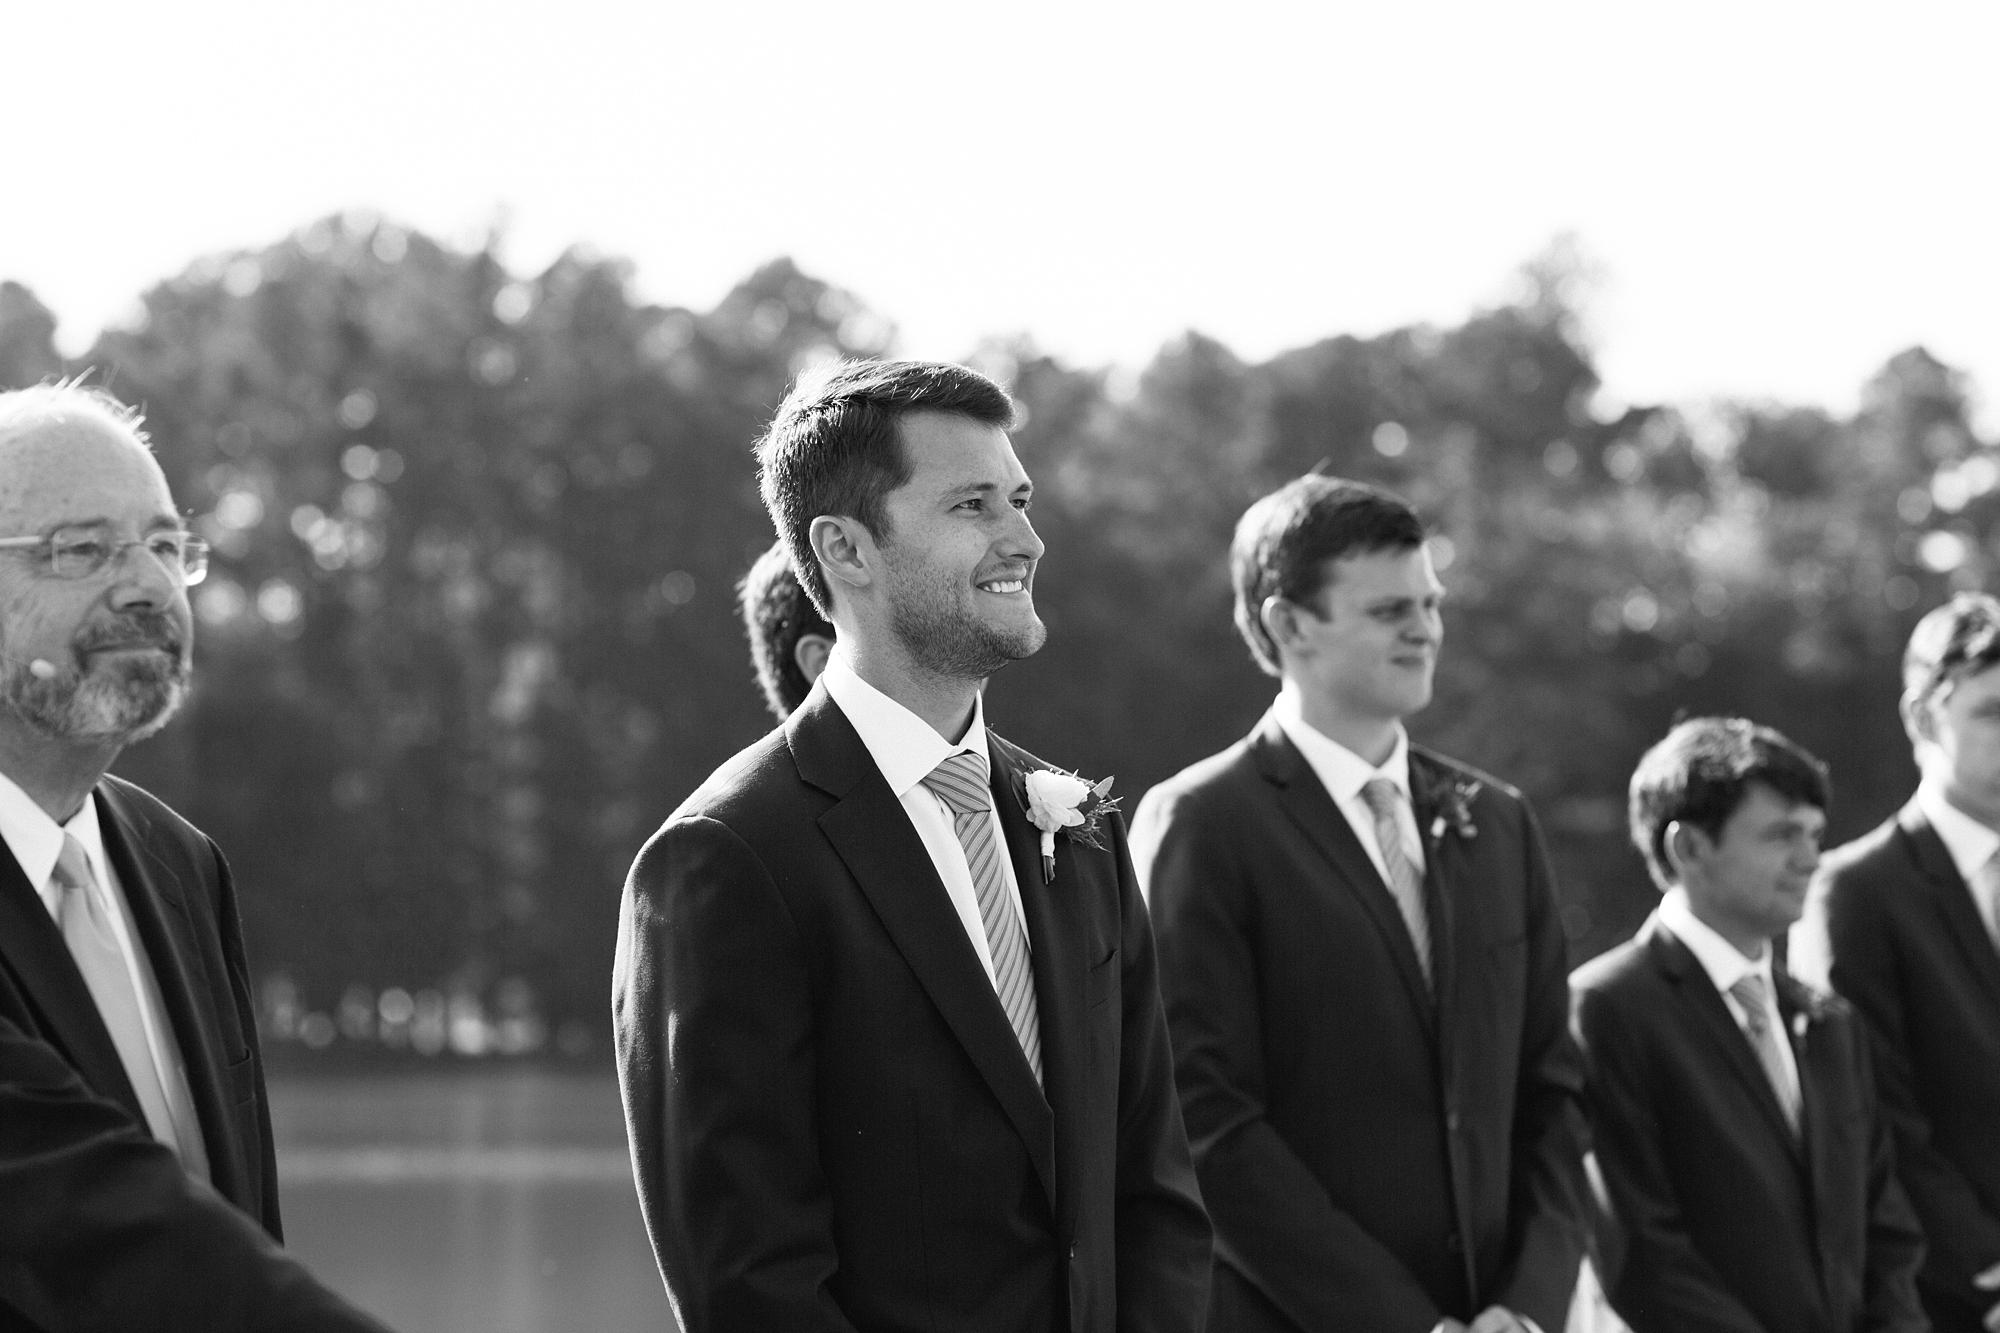 Angus-Barn-Pavilion-Raleigh-Wedding-Film-Photographer_0151.jpg